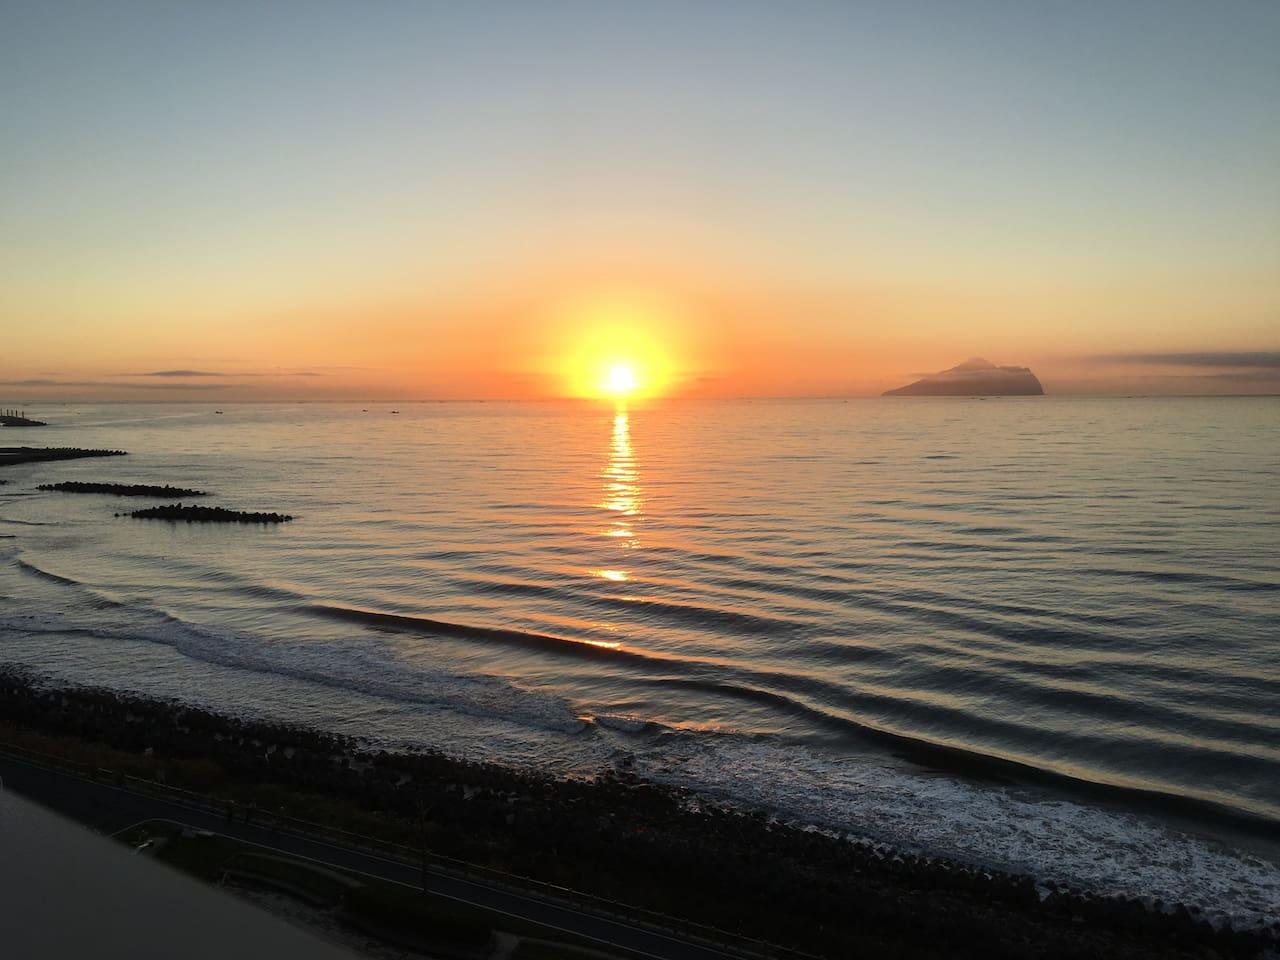 陽台輕鬆看日出 Sunrise on the balcony